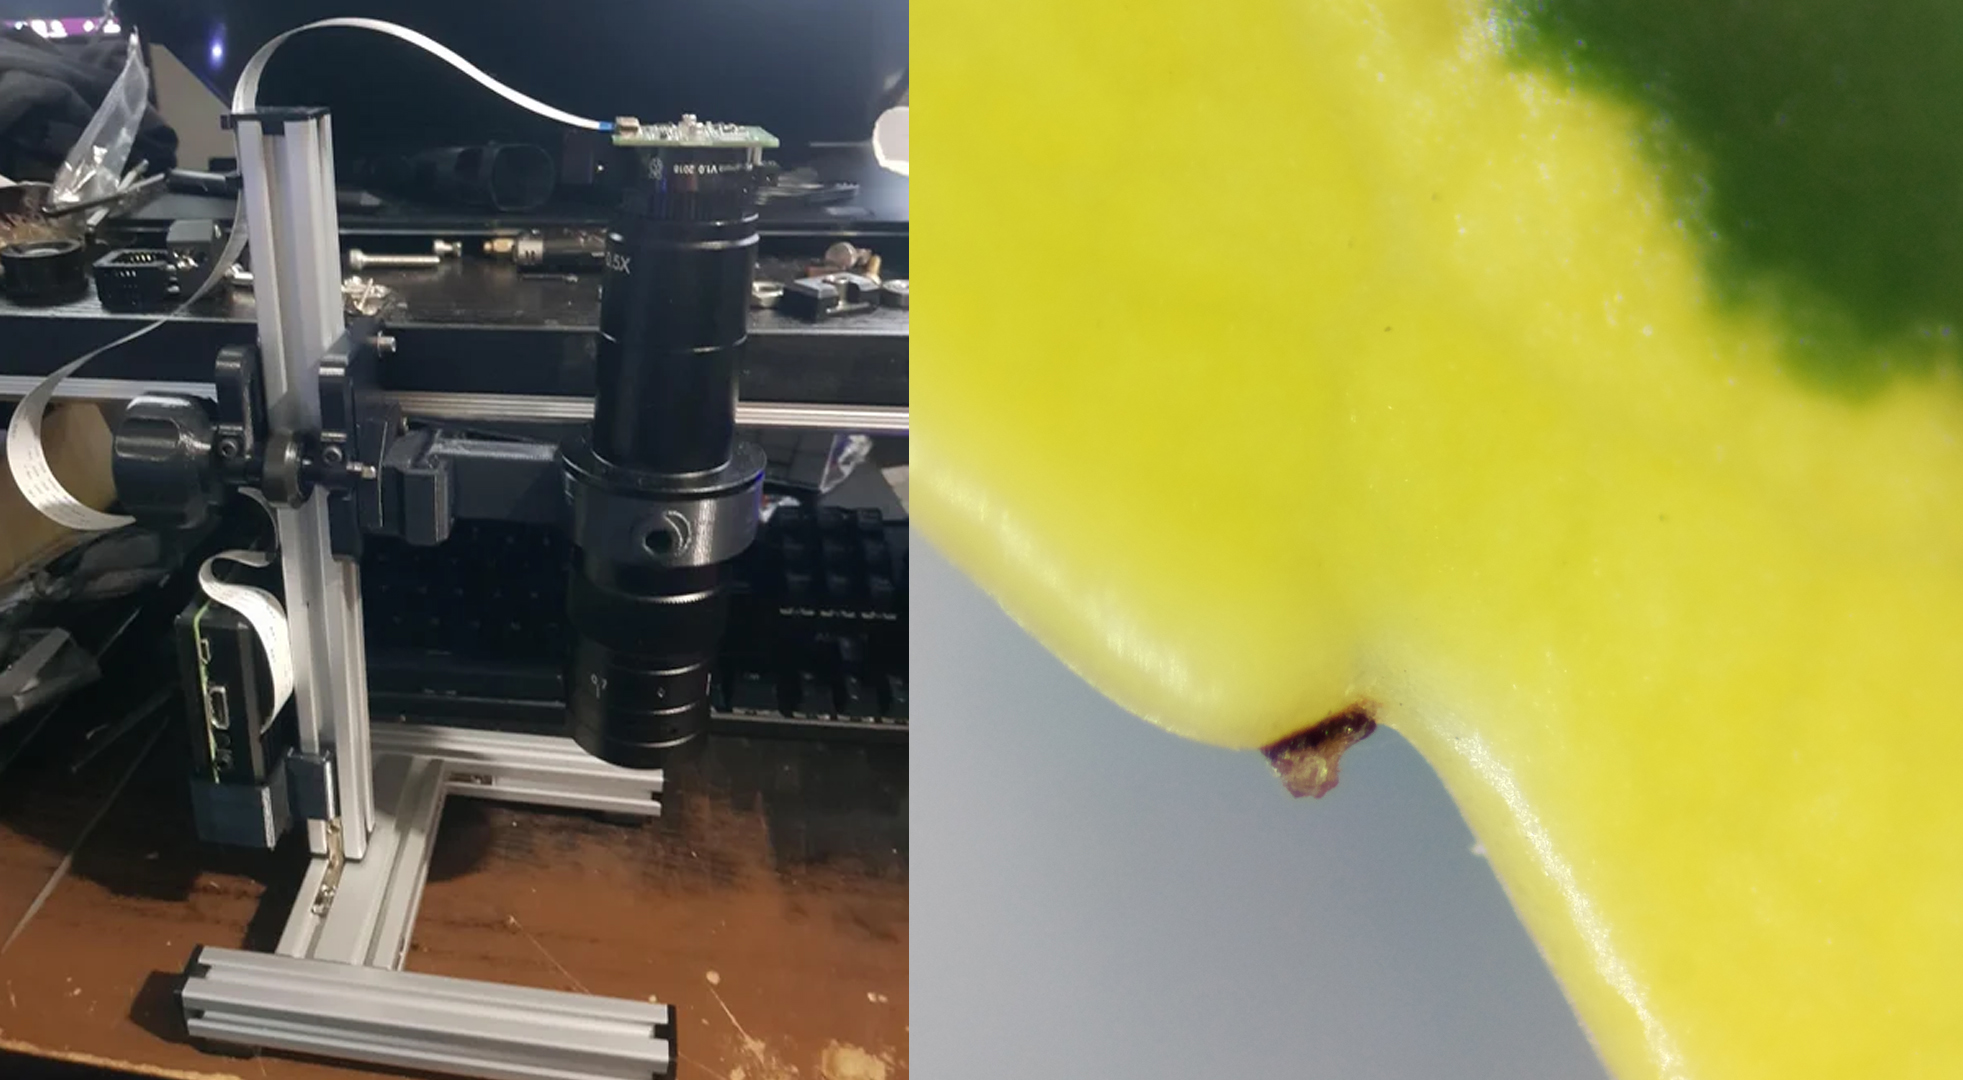 DIY Microscope Uses Raspberry Pi HQ Camera to Take Impressive Photos